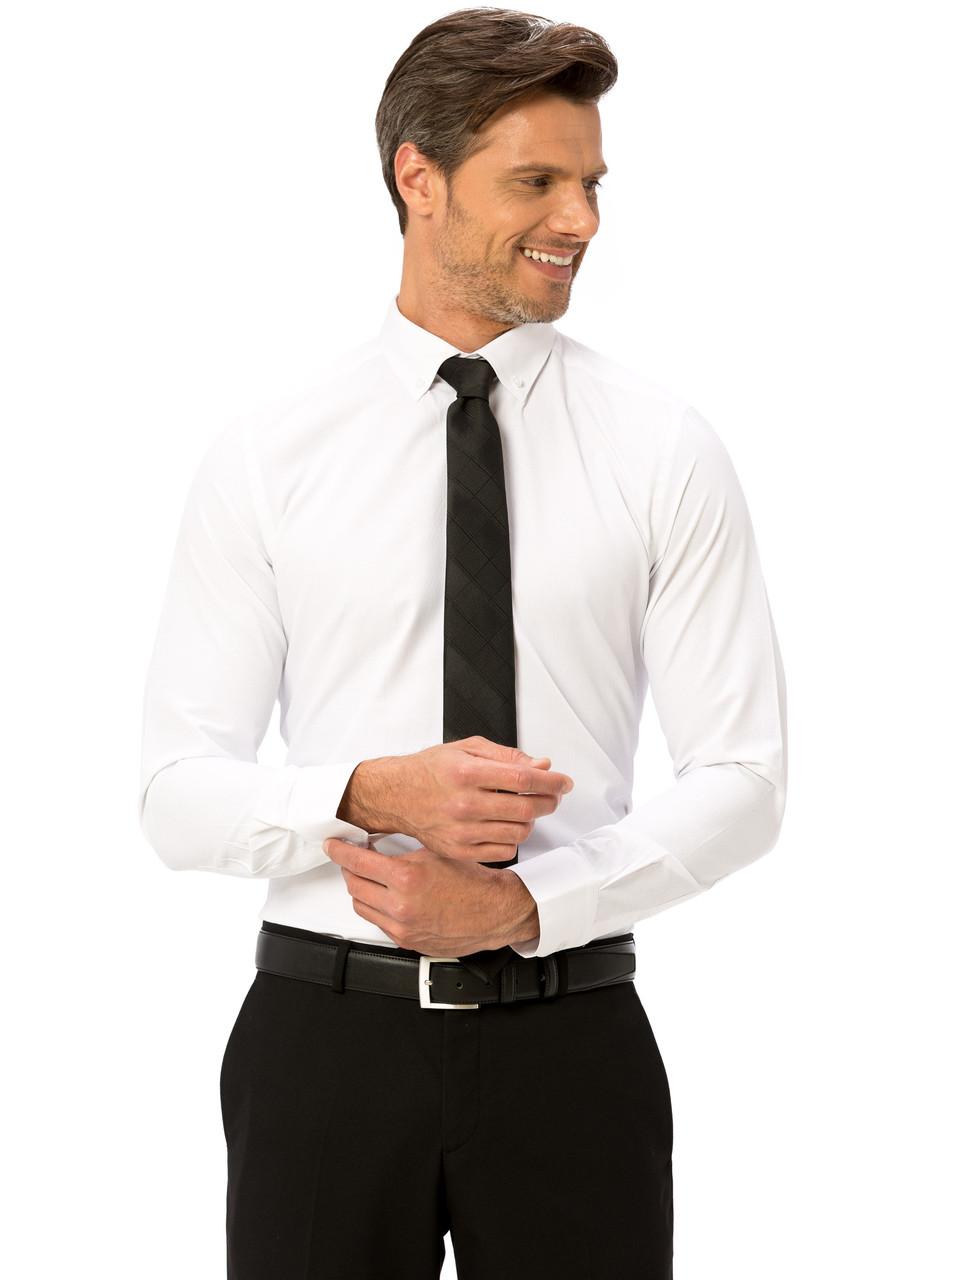 Белая мужская рубашка LC Waikiki / ЛС Вайкики в белый мелкий ромбик, с пуговицами на воротнике